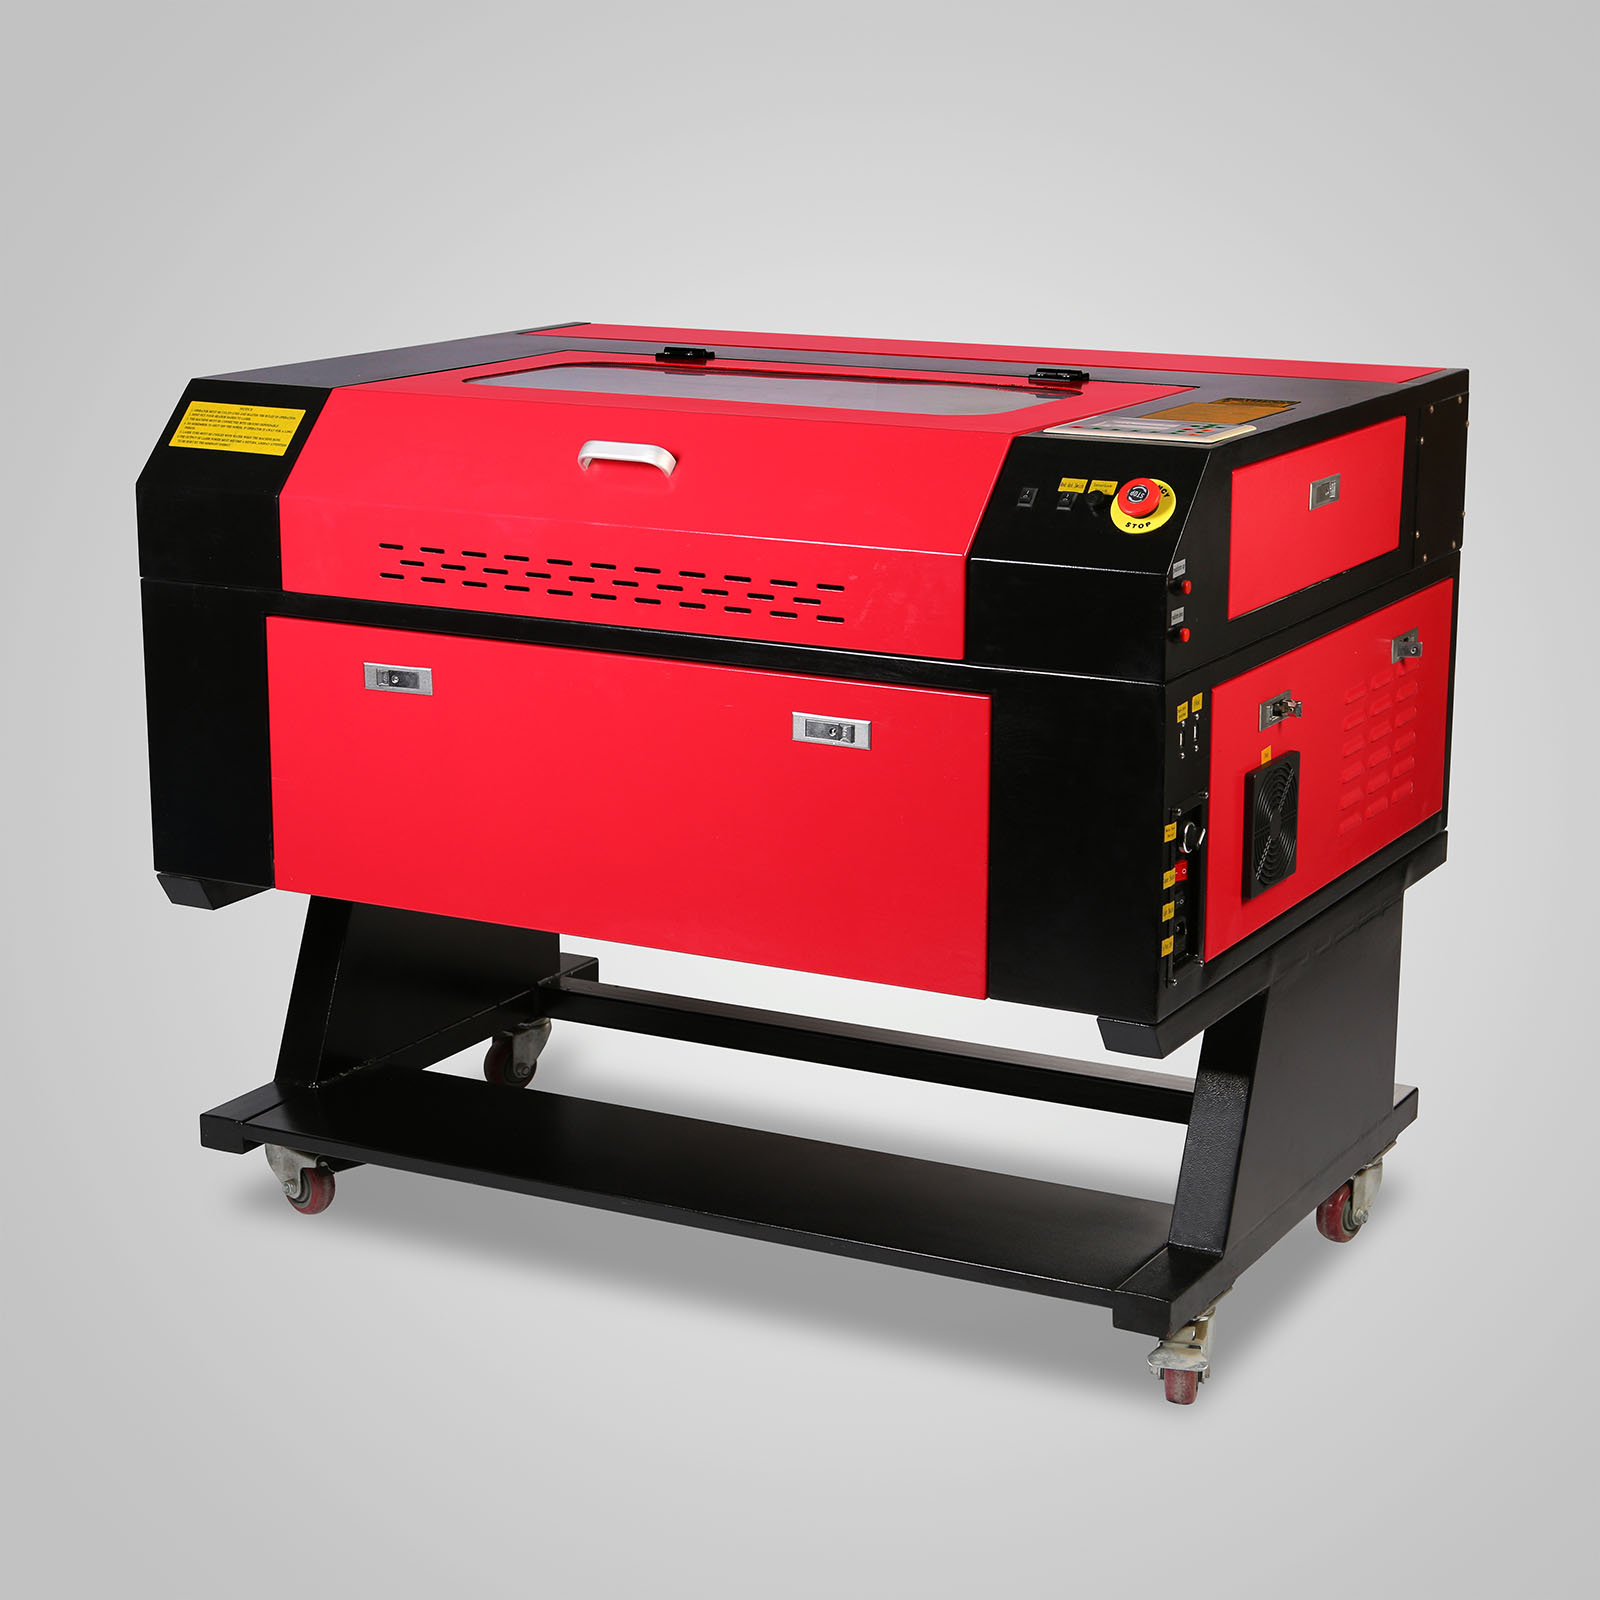 Macchina-per-Incisione-Laser-CO2-40-130W-Asse-Rotante-Tagliatrice-Incisore miniatura 39